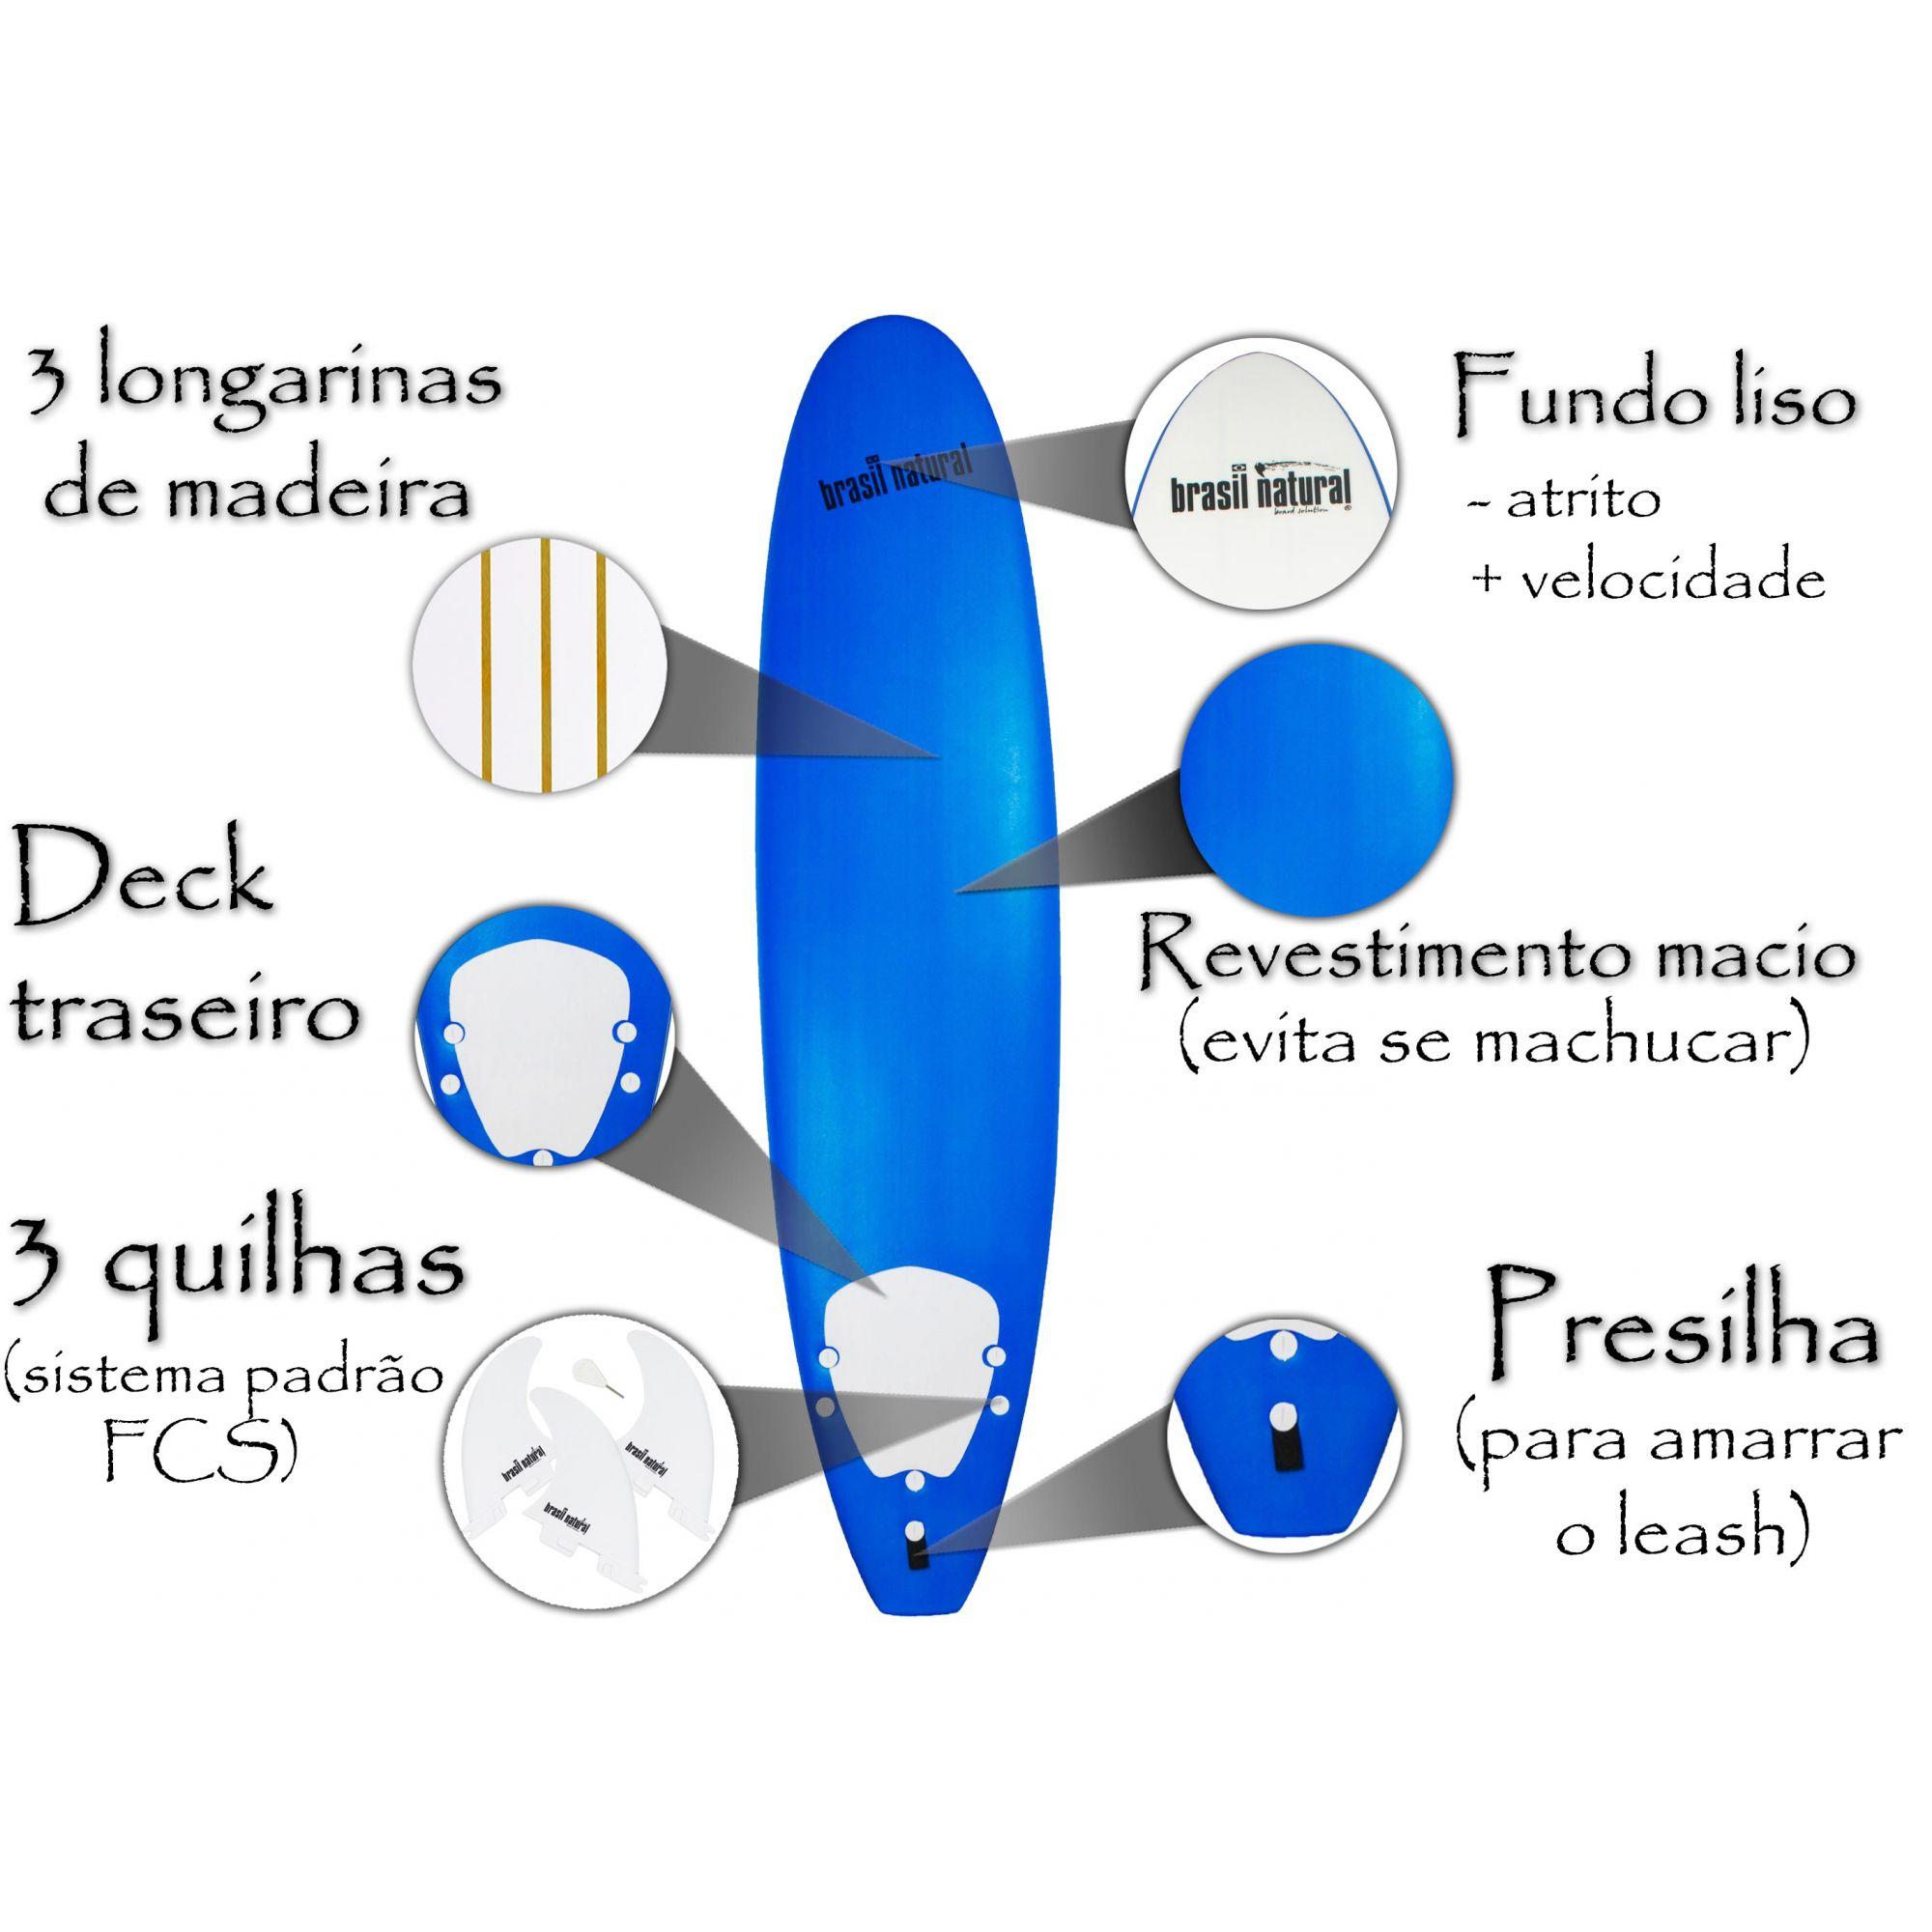 Prancha de surf fun board 7.6 NEW EDITION + kit surf - Brasil Natural